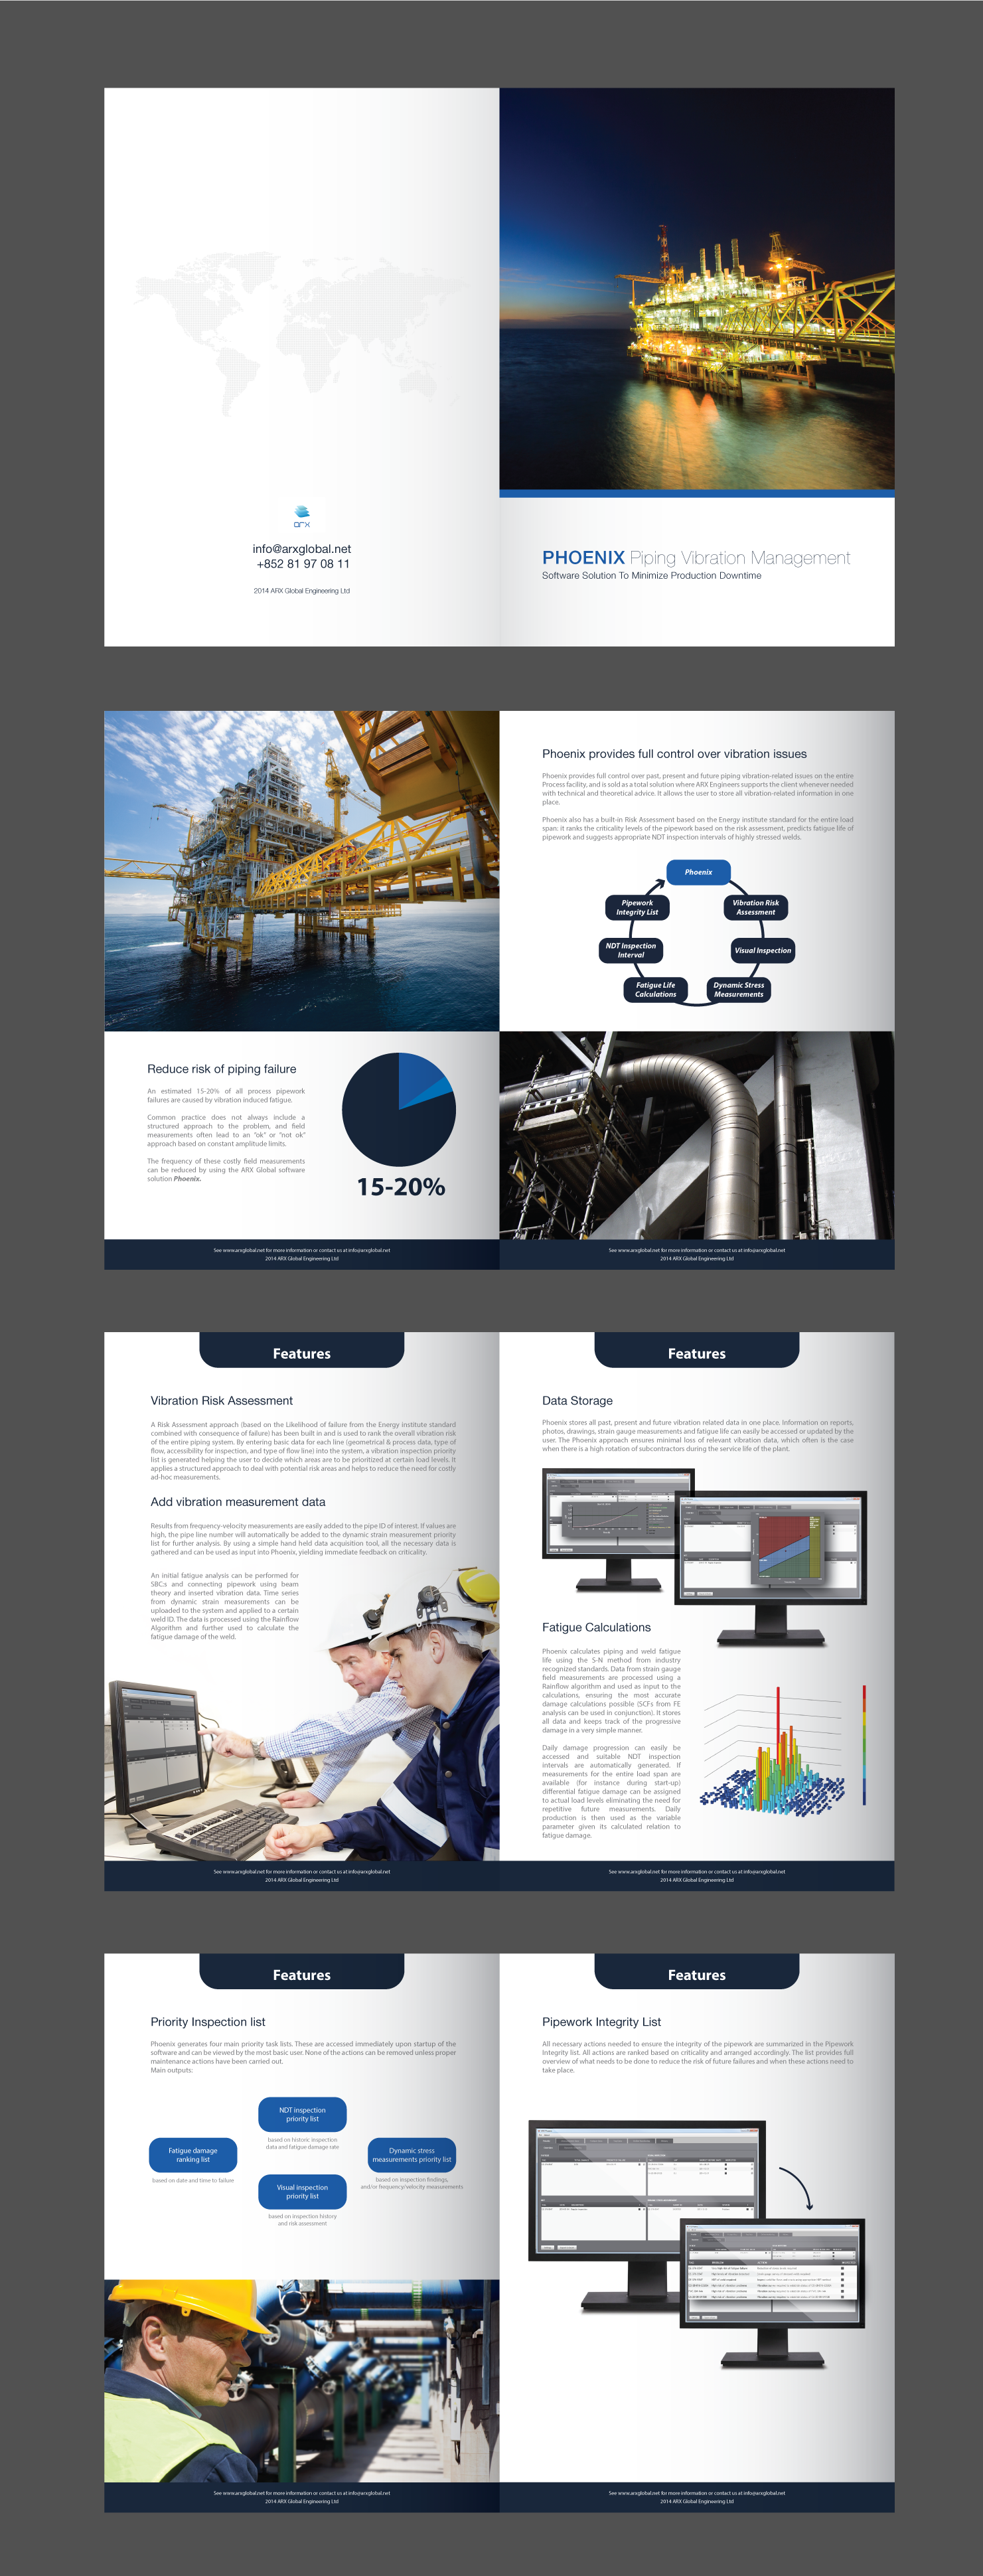 Create a brochure for software program for oil platforms